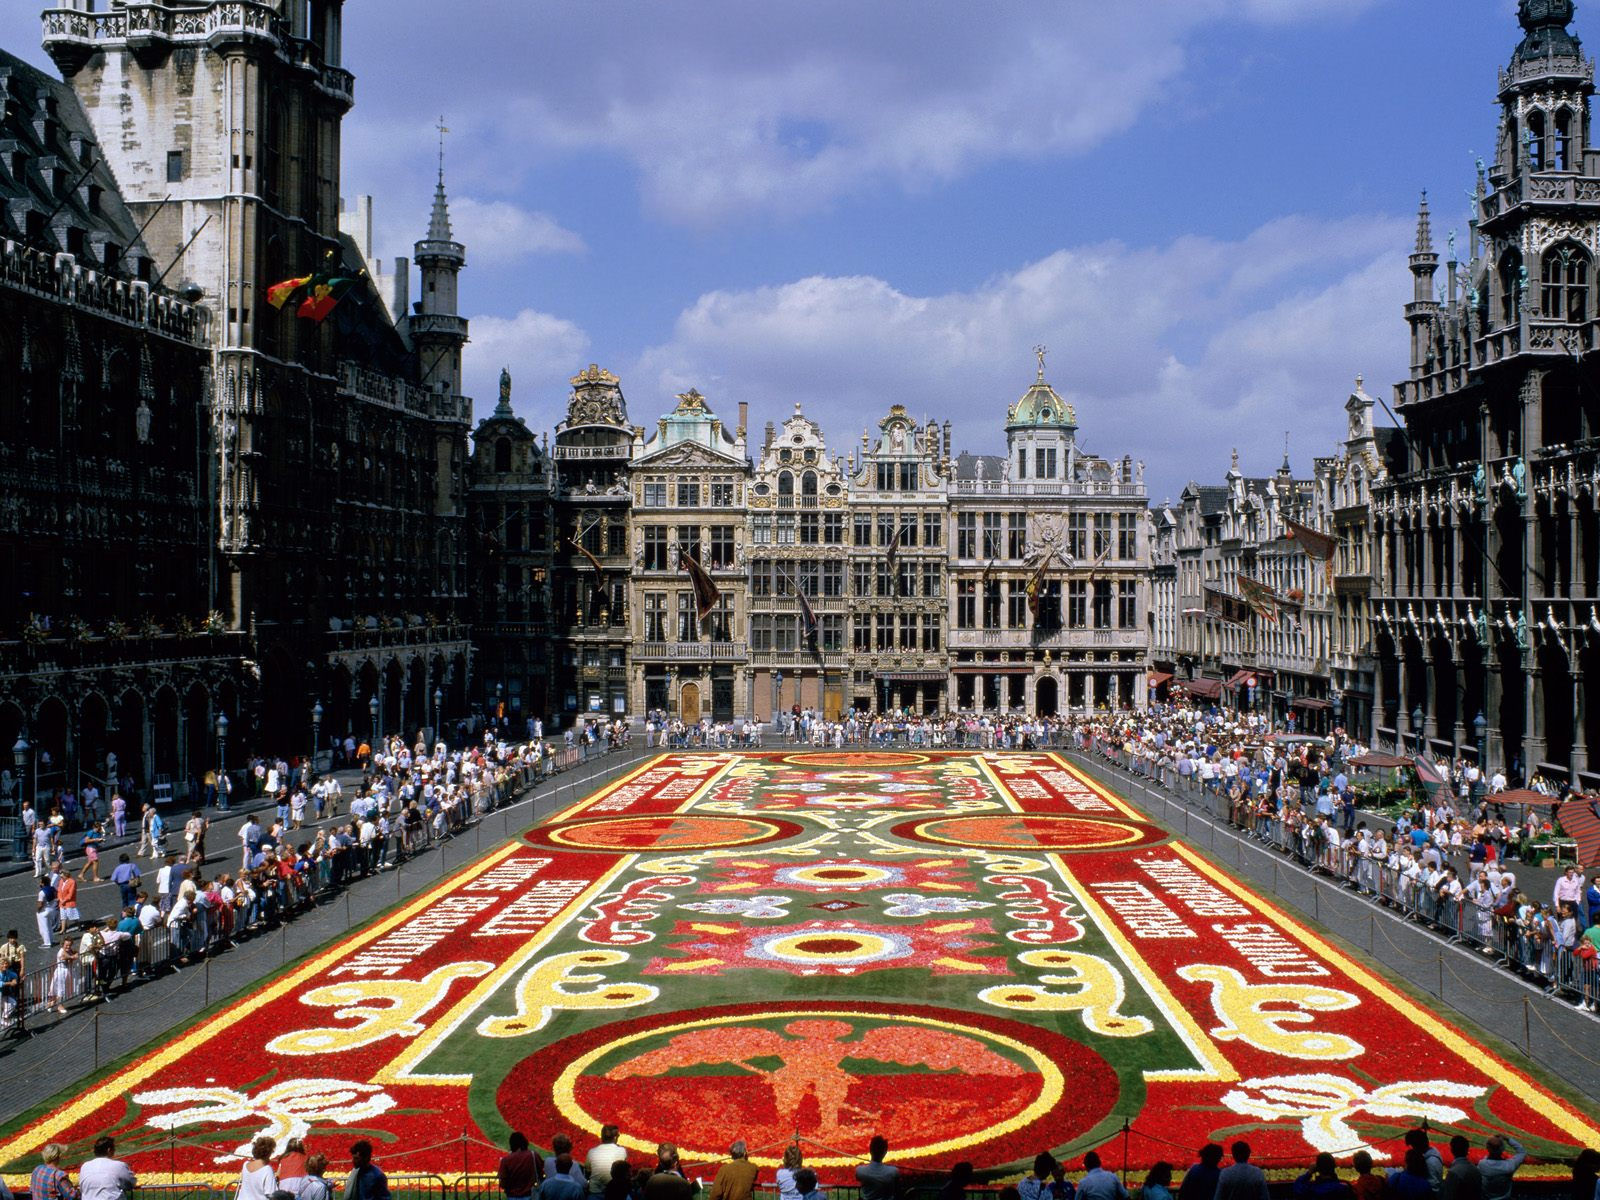 grand-place-brussels-belgium